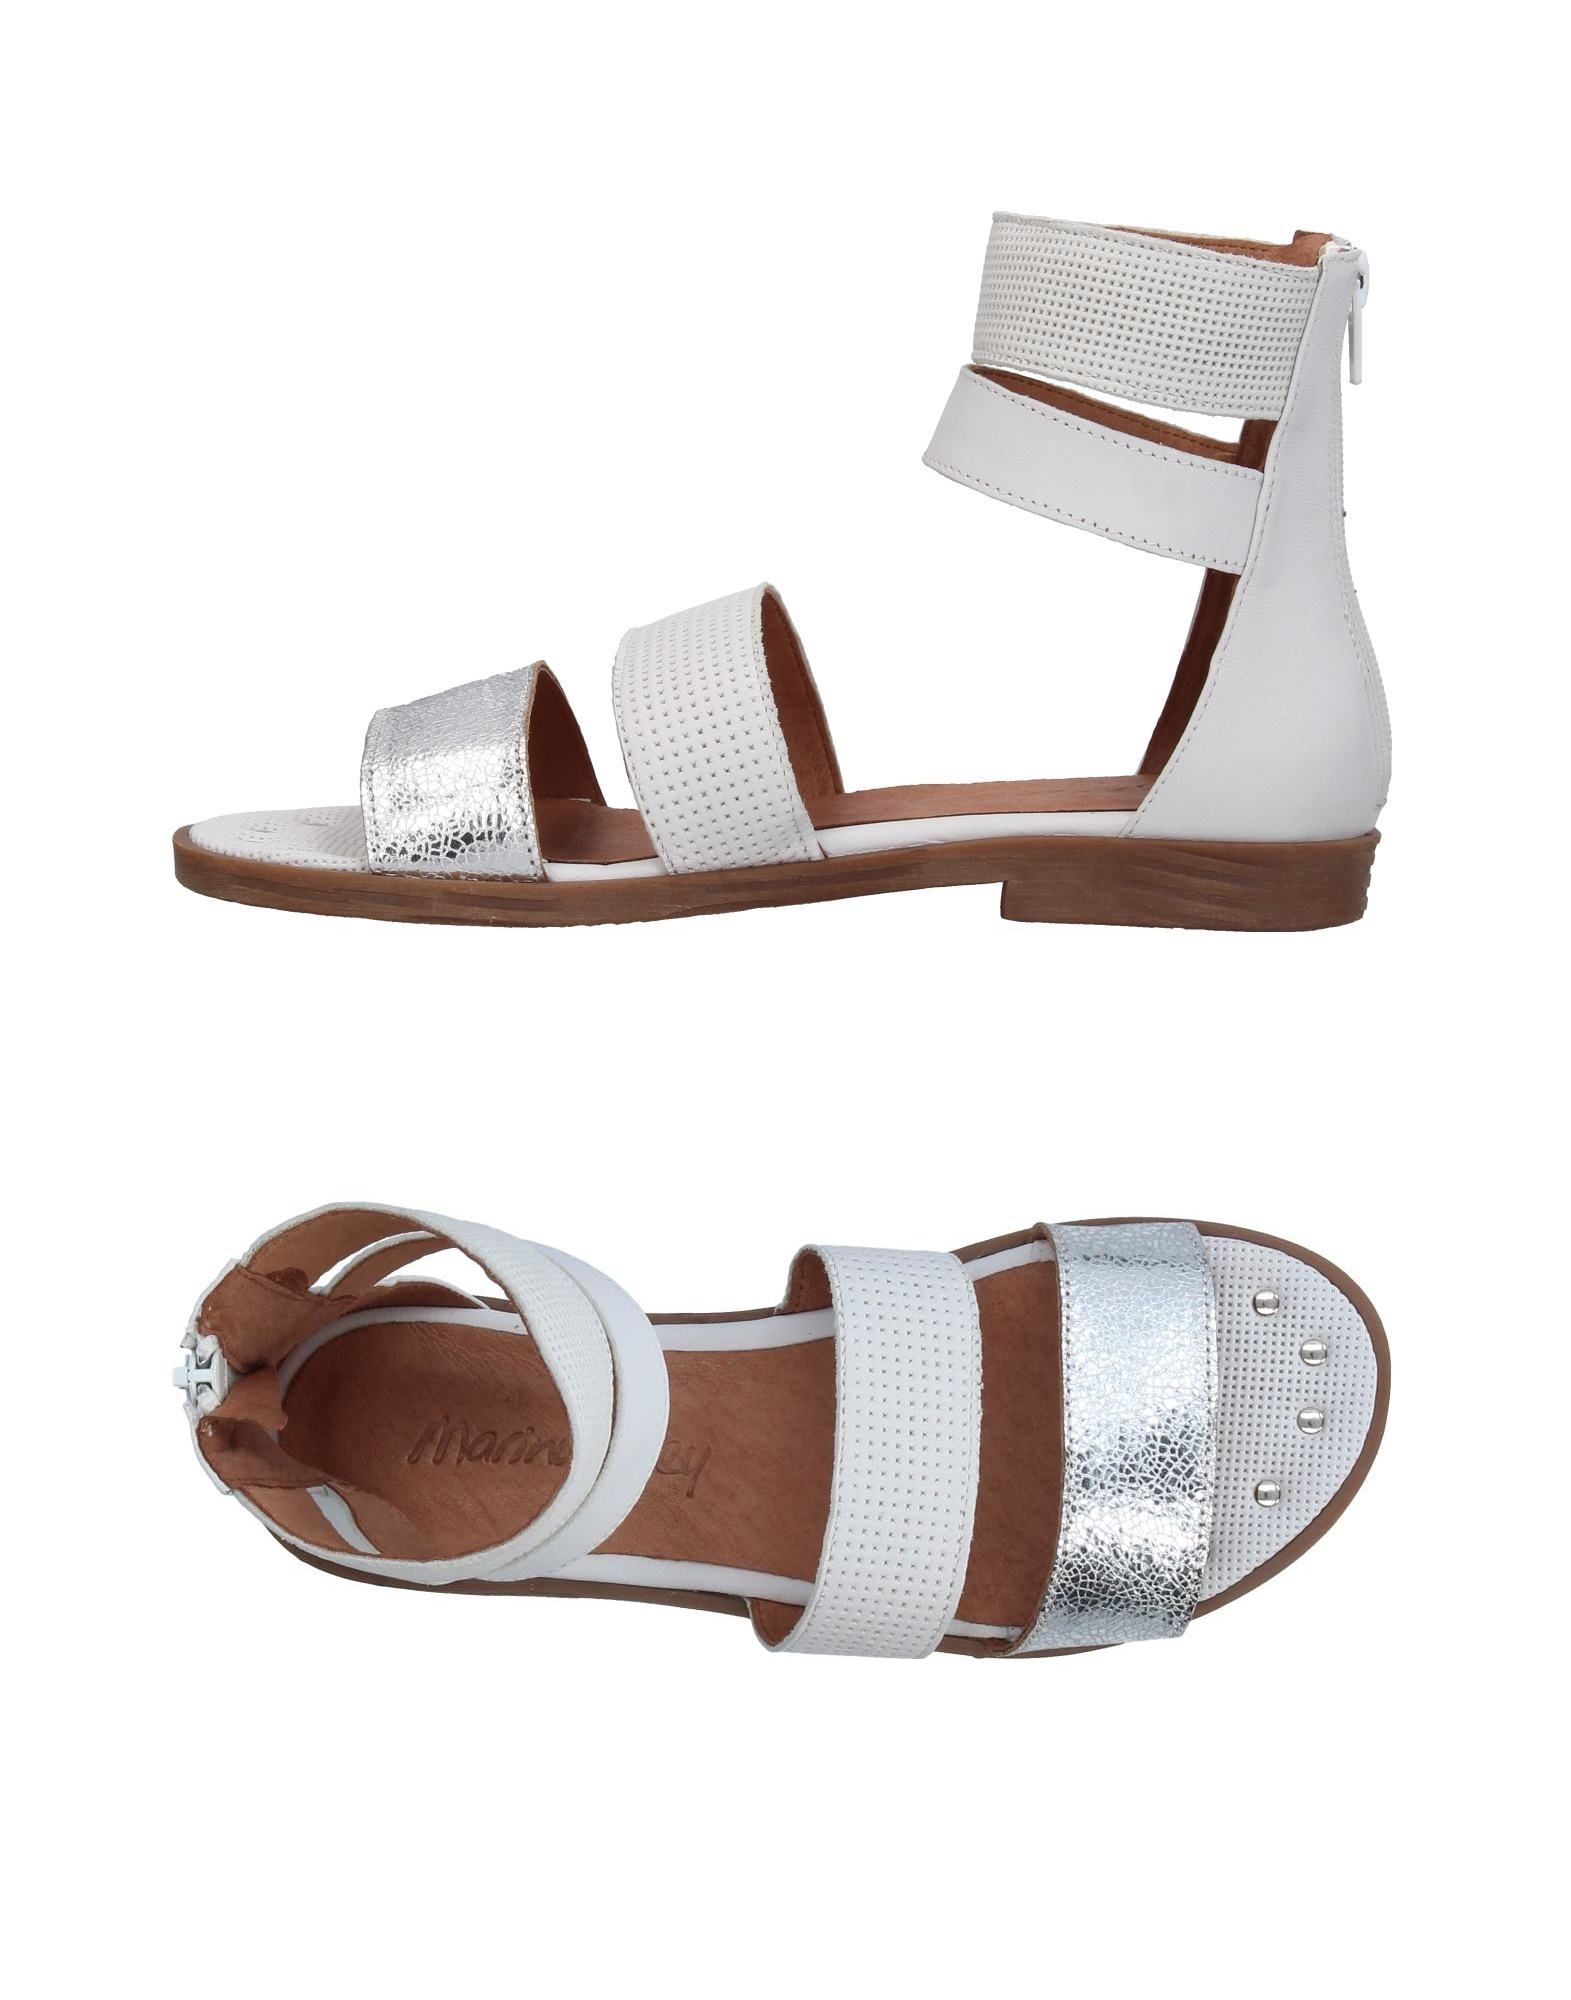 Marina Grey Sandalen Damen  Qualität 11373995EE Gute Qualität  beliebte Schuhe ec565b